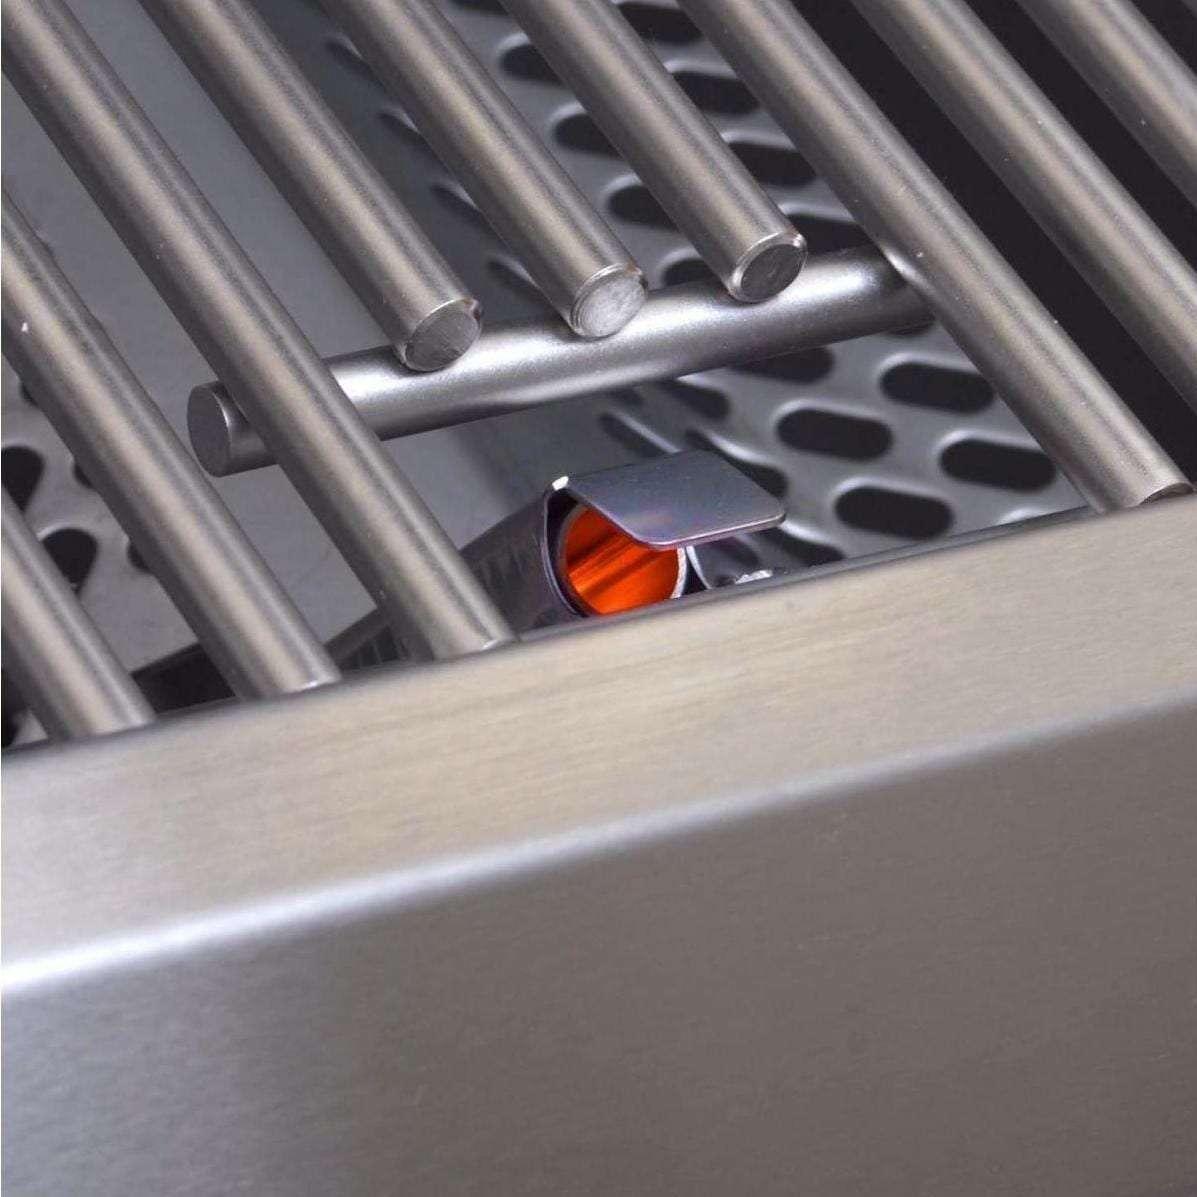 Fire Magic Echelon Diamond E1060s Gas Grill - Hot Surface Ignition